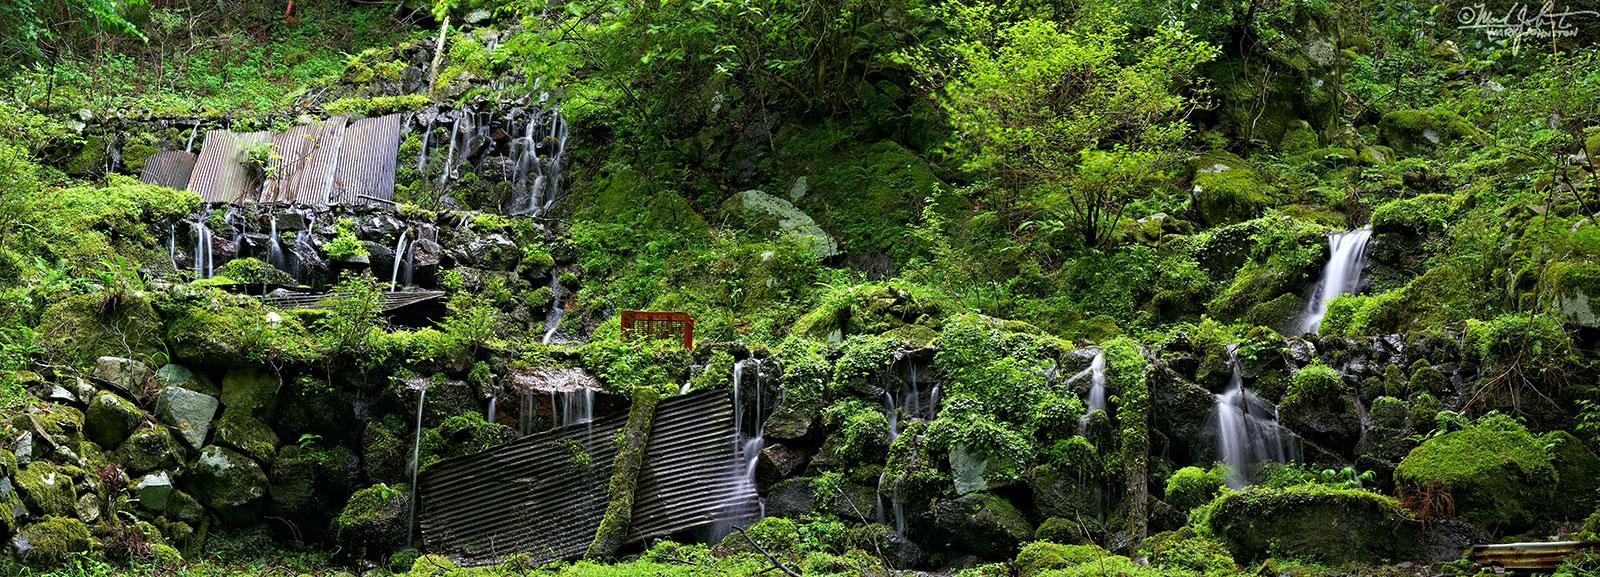 An abandoned wasabi field in the Amagi Mountains of the Izu Peninsula, Shizuoka Prefecture, Japan.